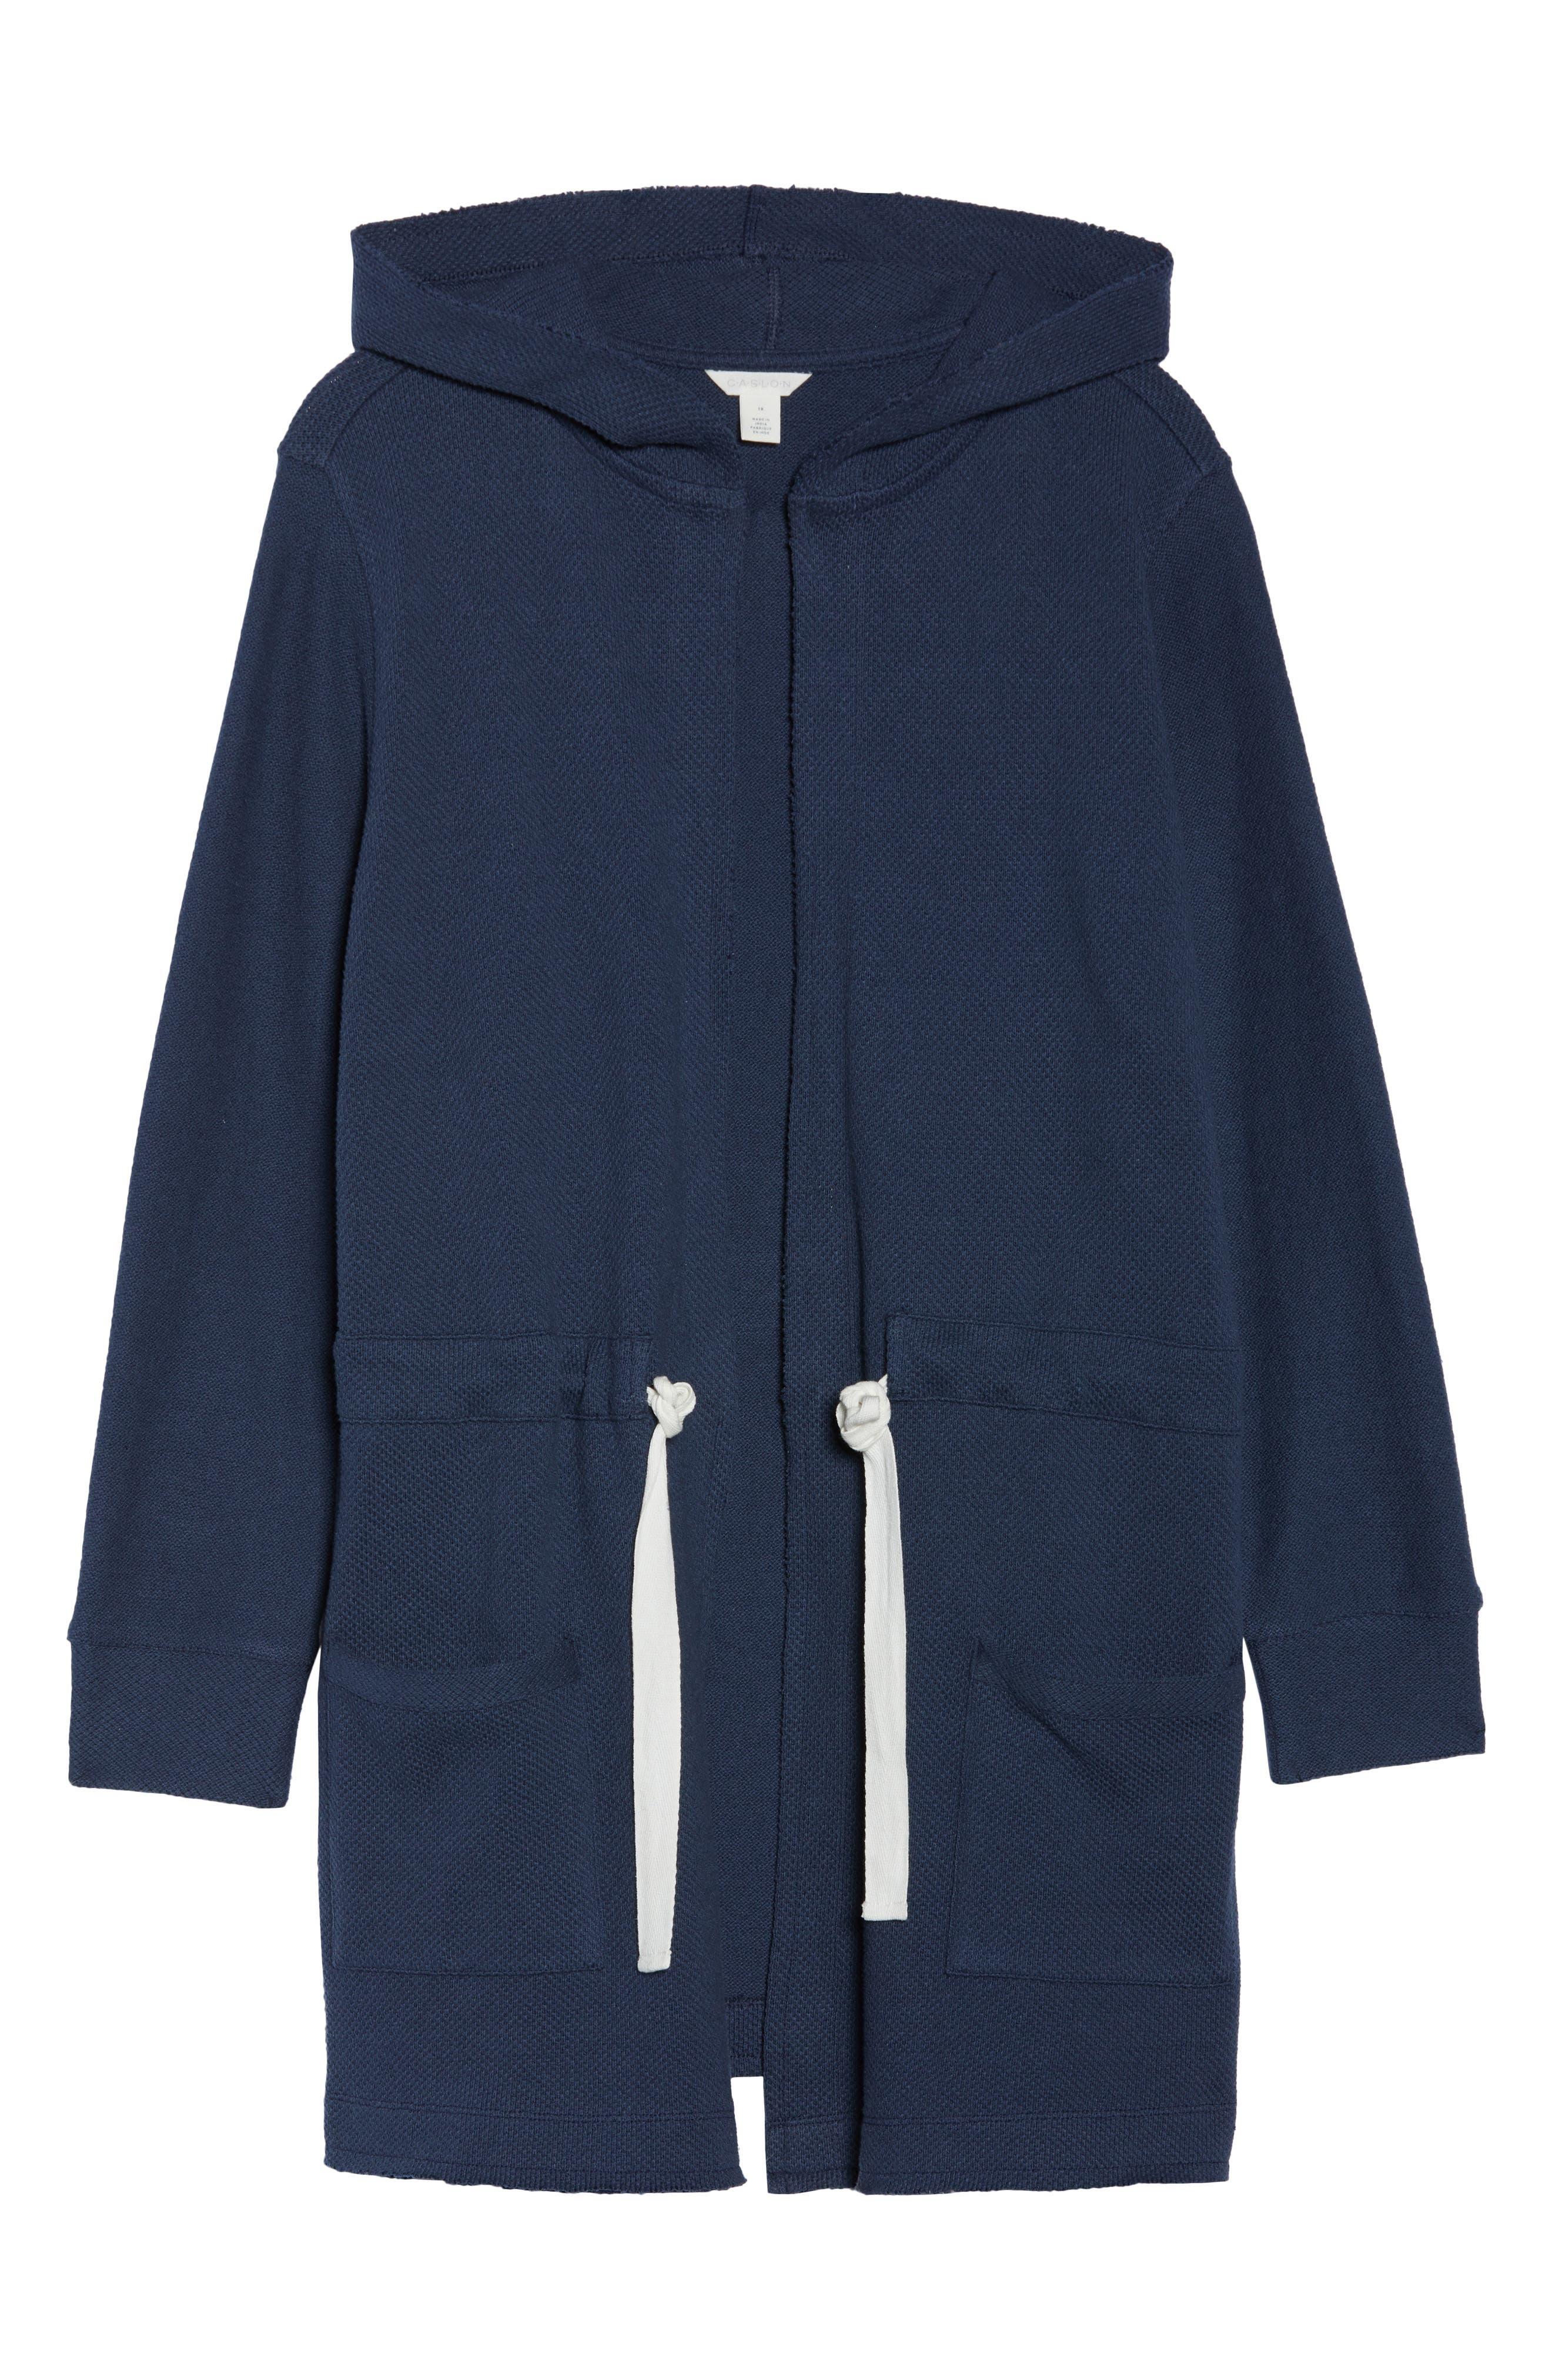 Tie Waist Knit Hooded Jacket,                             Alternate thumbnail 7, color,                             Navy Indigo